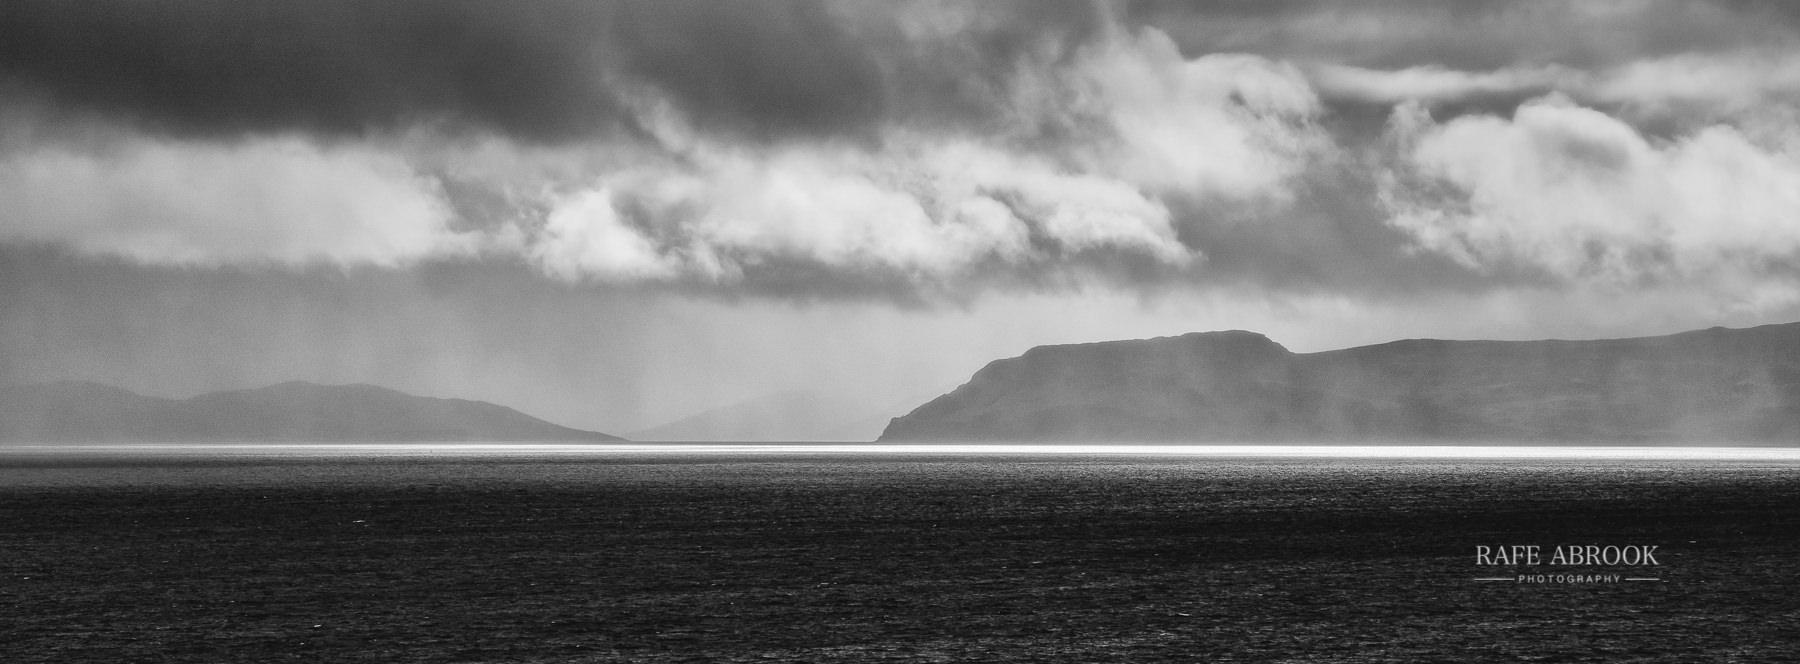 north coast 500 scotland porsche cayman gt4 golf r estate rafe abrook photography-1333.jpg